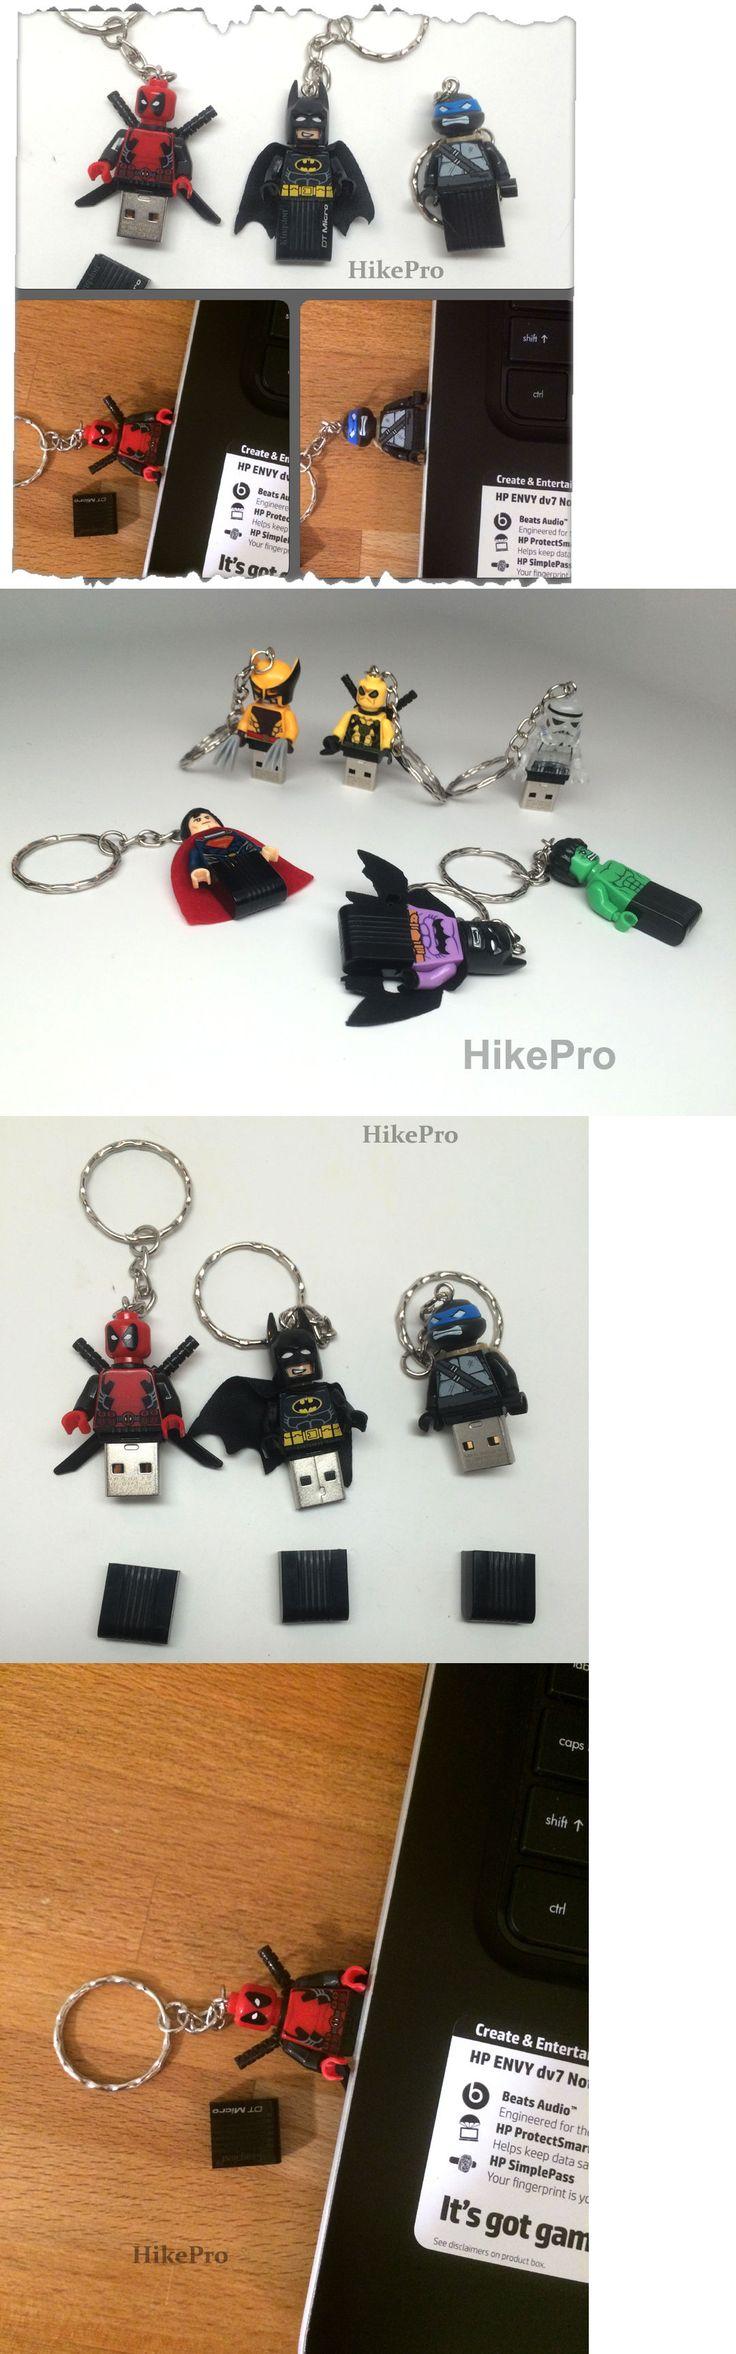 Dolls and Toys 83905: Lego Minifig Custom Usb Flash Drive Keychain Deadpool Goku Darth Vader Batman -> BUY IT NOW ONLY: $30.95 on eBay!